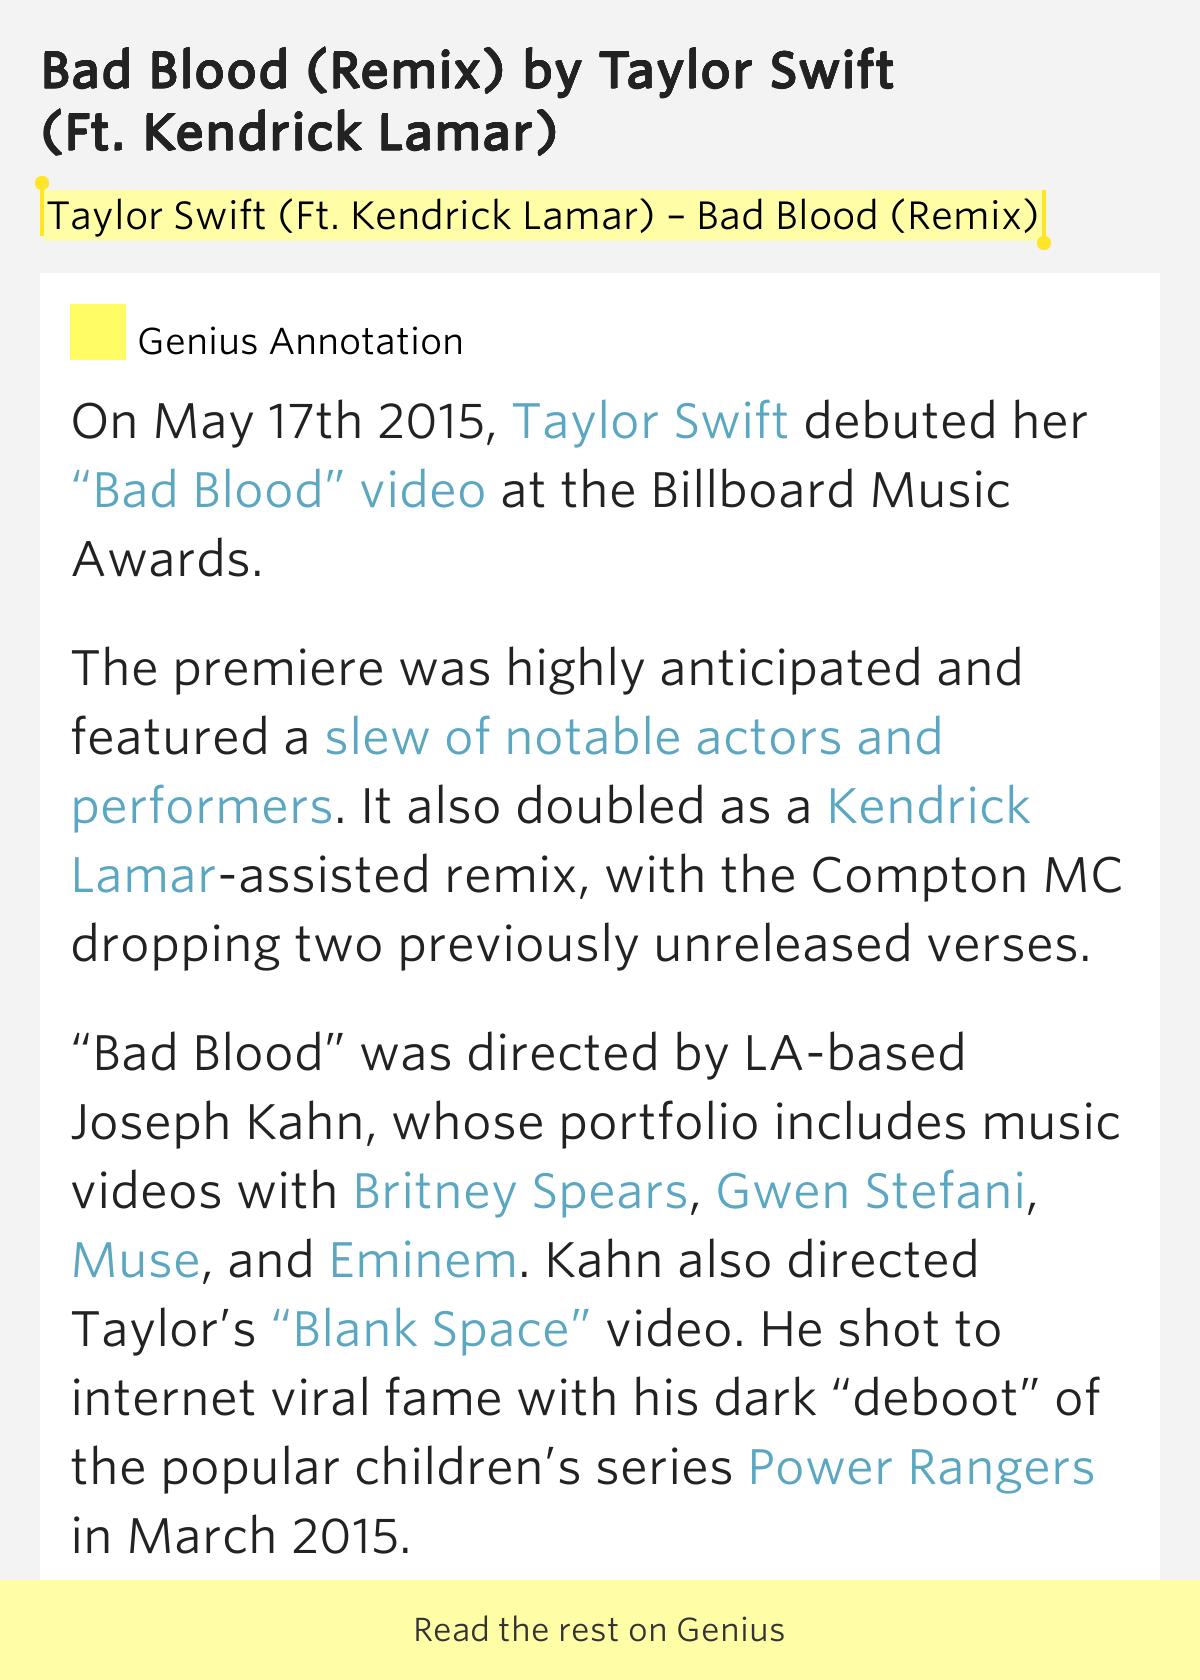 Descargar Mp3 de Britney Spears Inside Out musica gratis ...